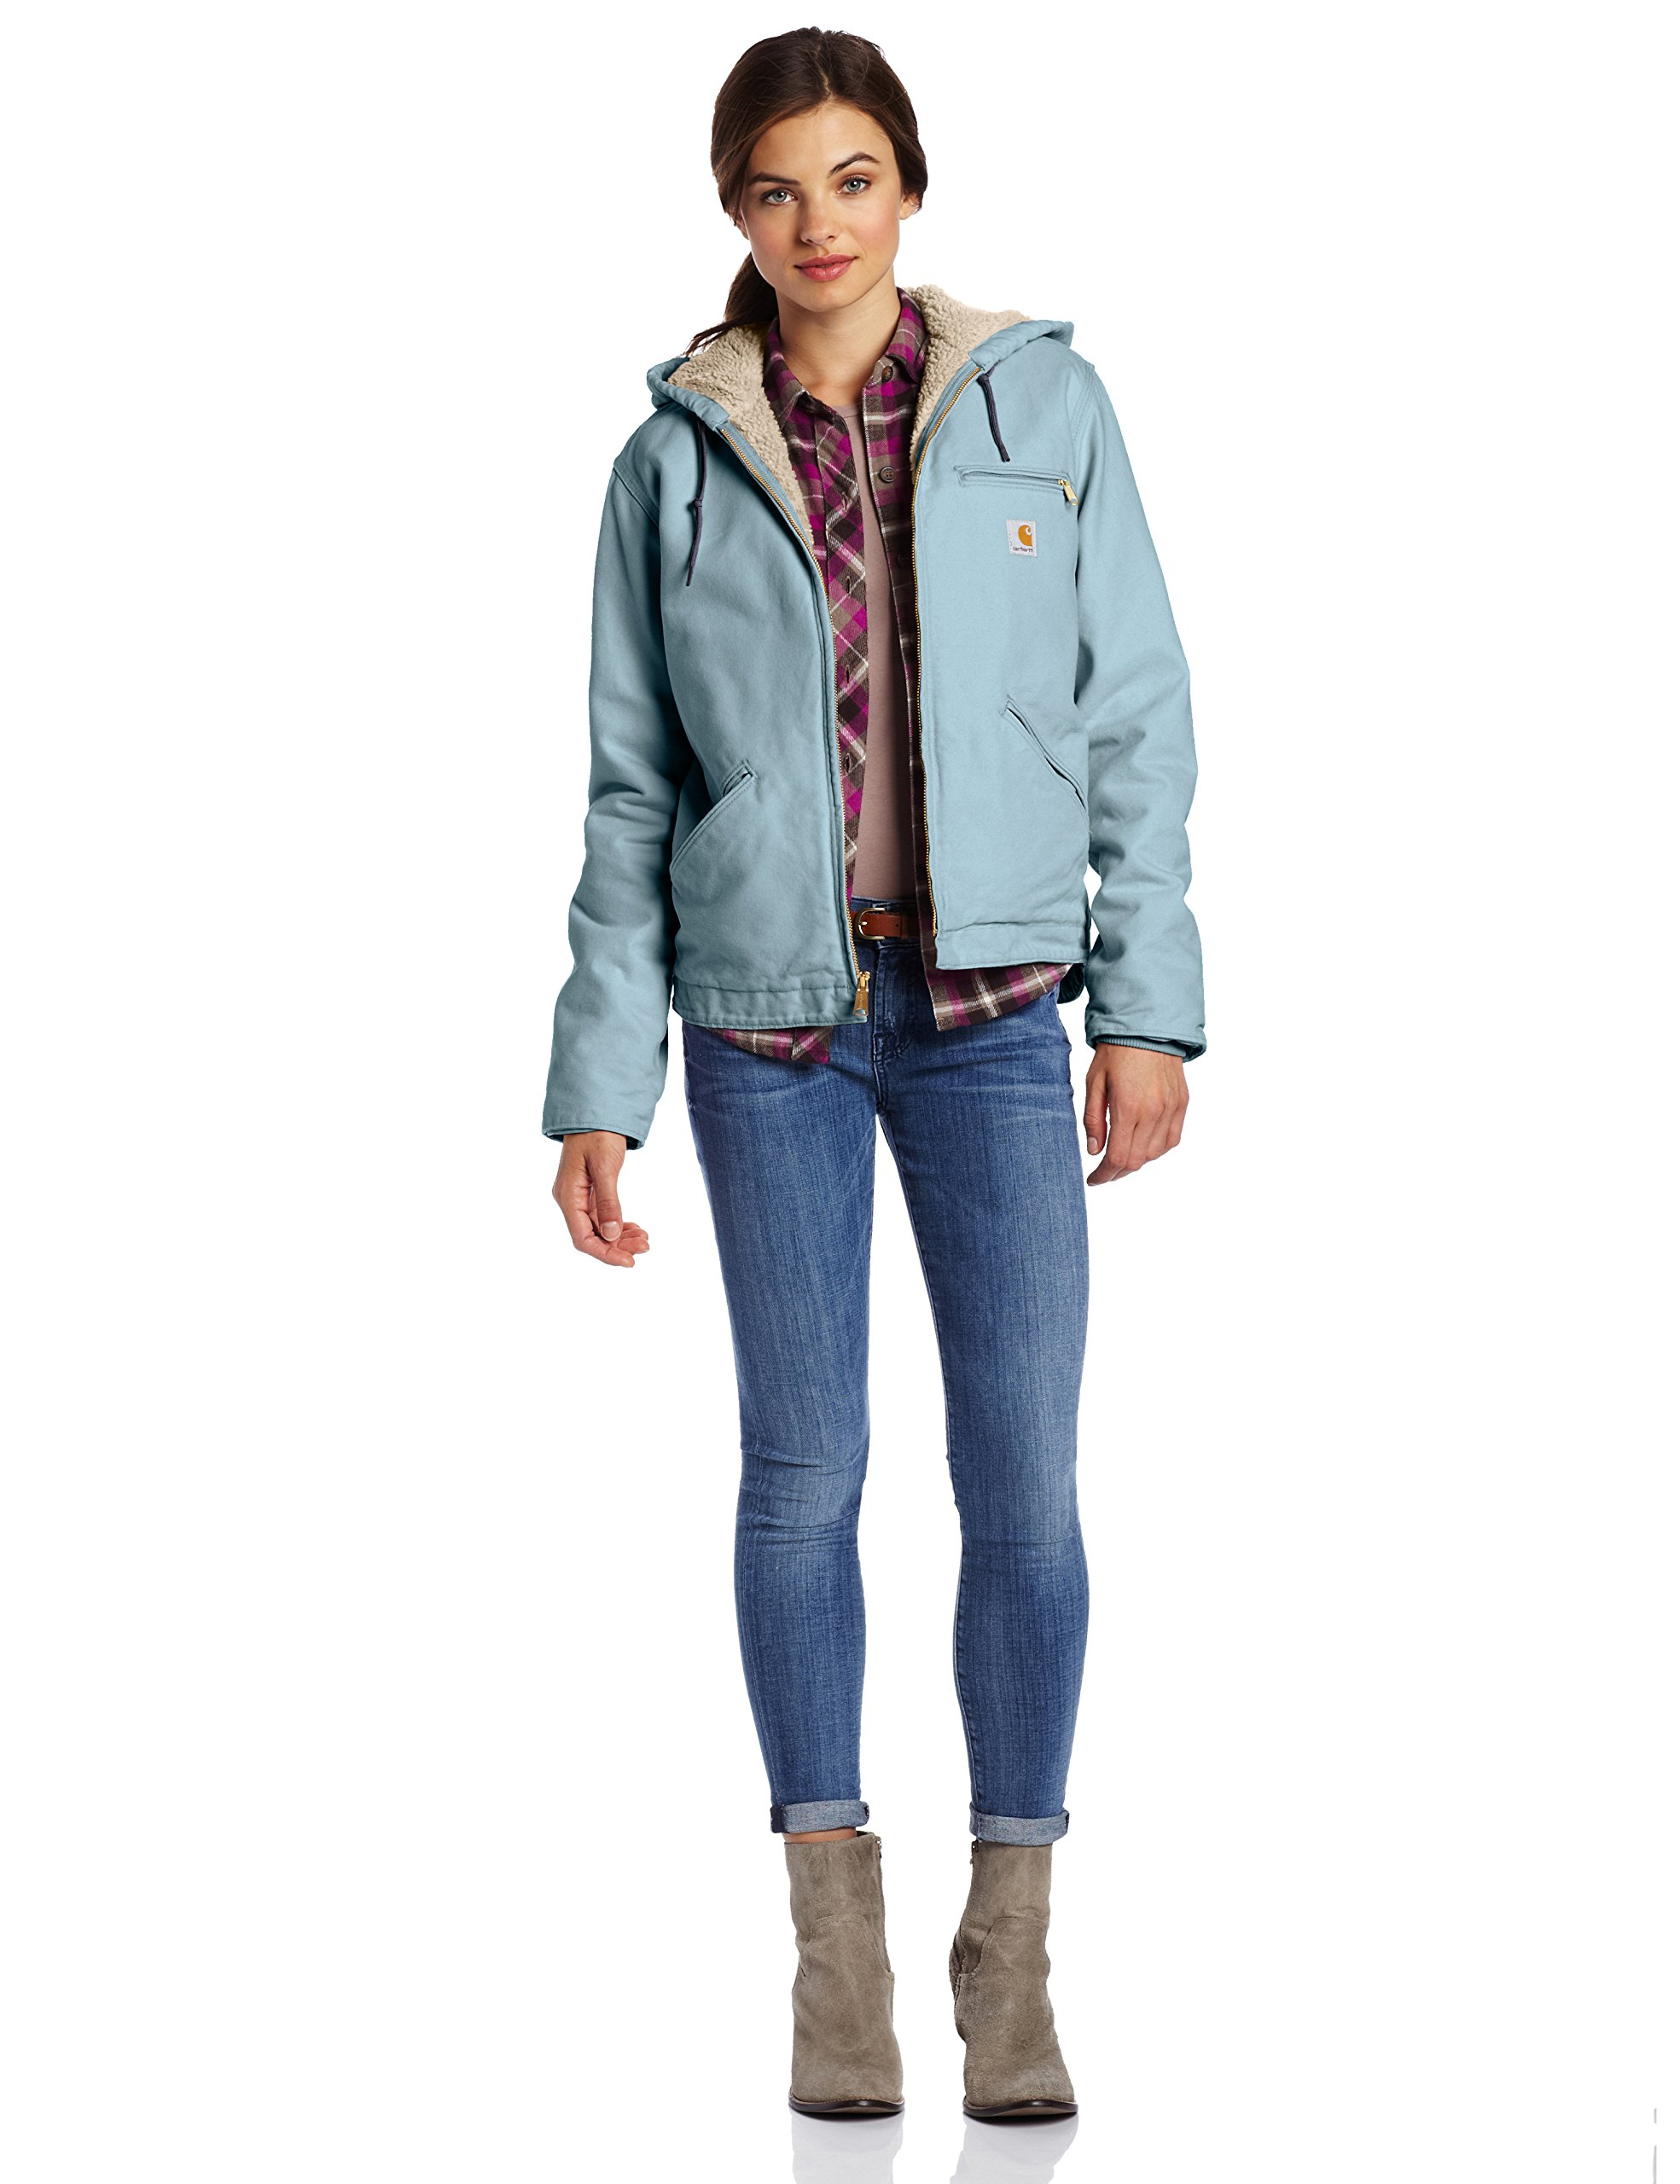 Carhartt Women's Sherpa Lined Sandstone Sierra Jacket (Regular and Plus Sizes), Sea Glass, X-Large by Carhartt